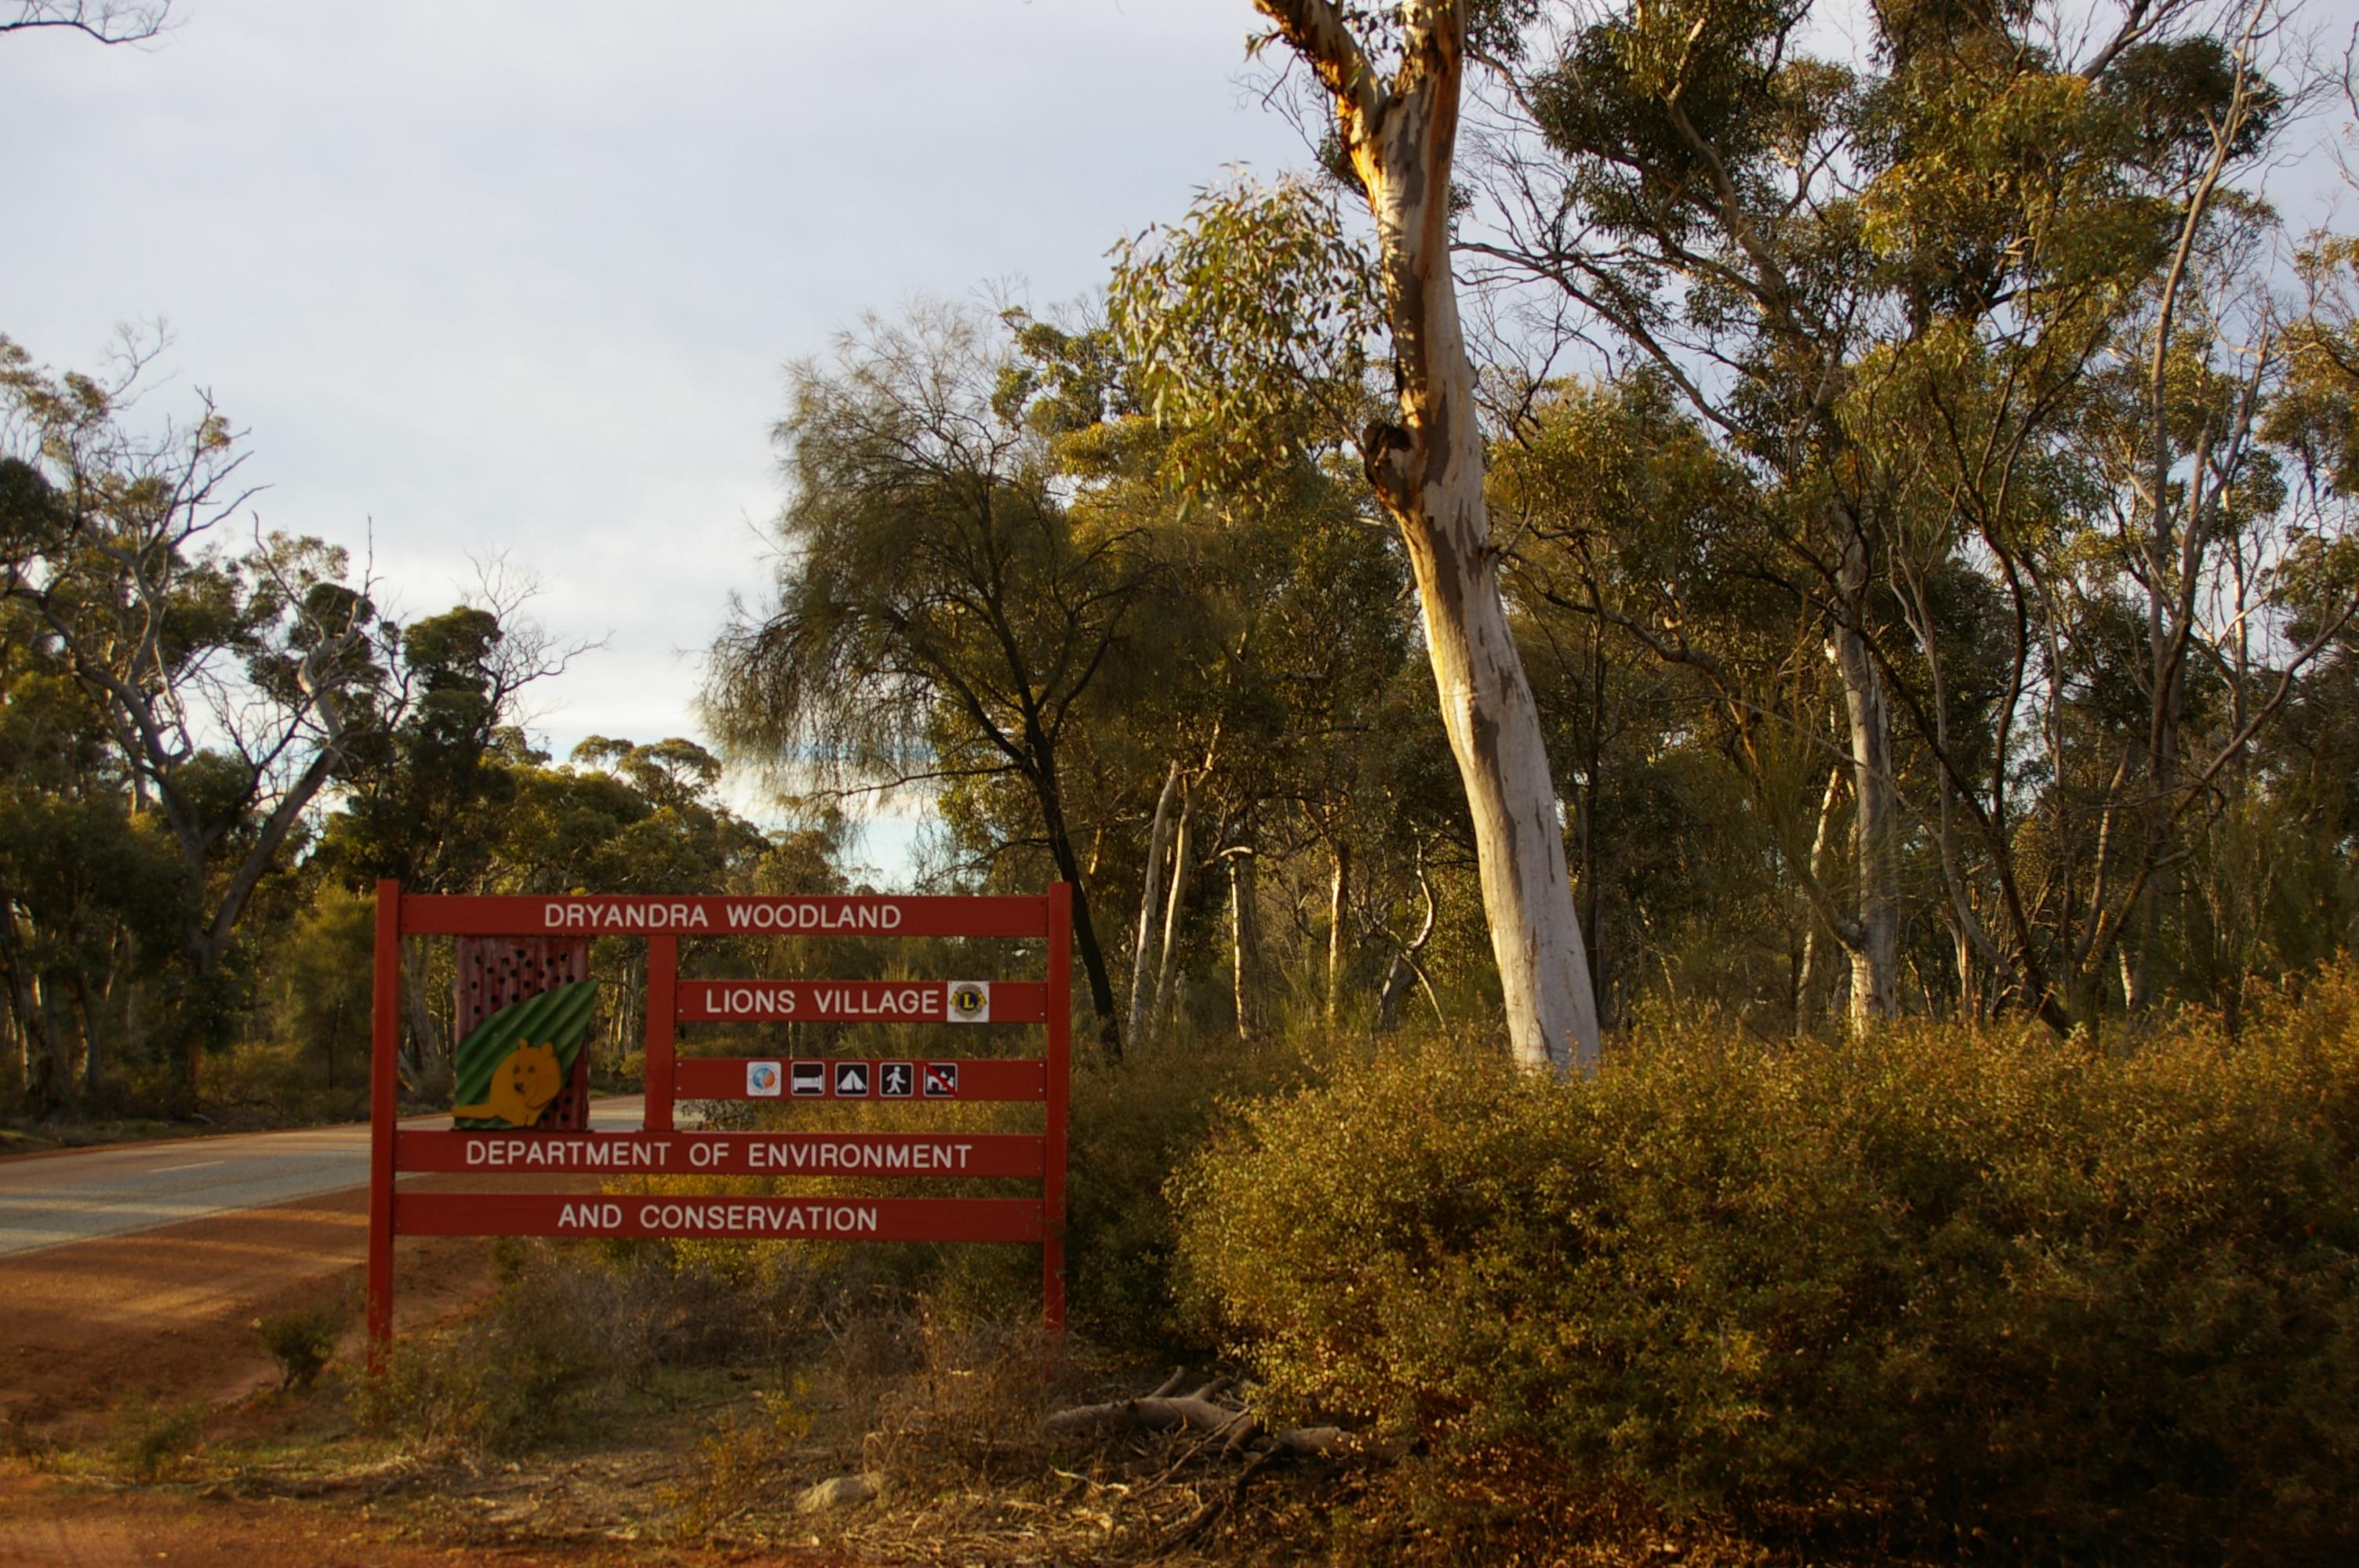 nsa meetup finda Western Australia